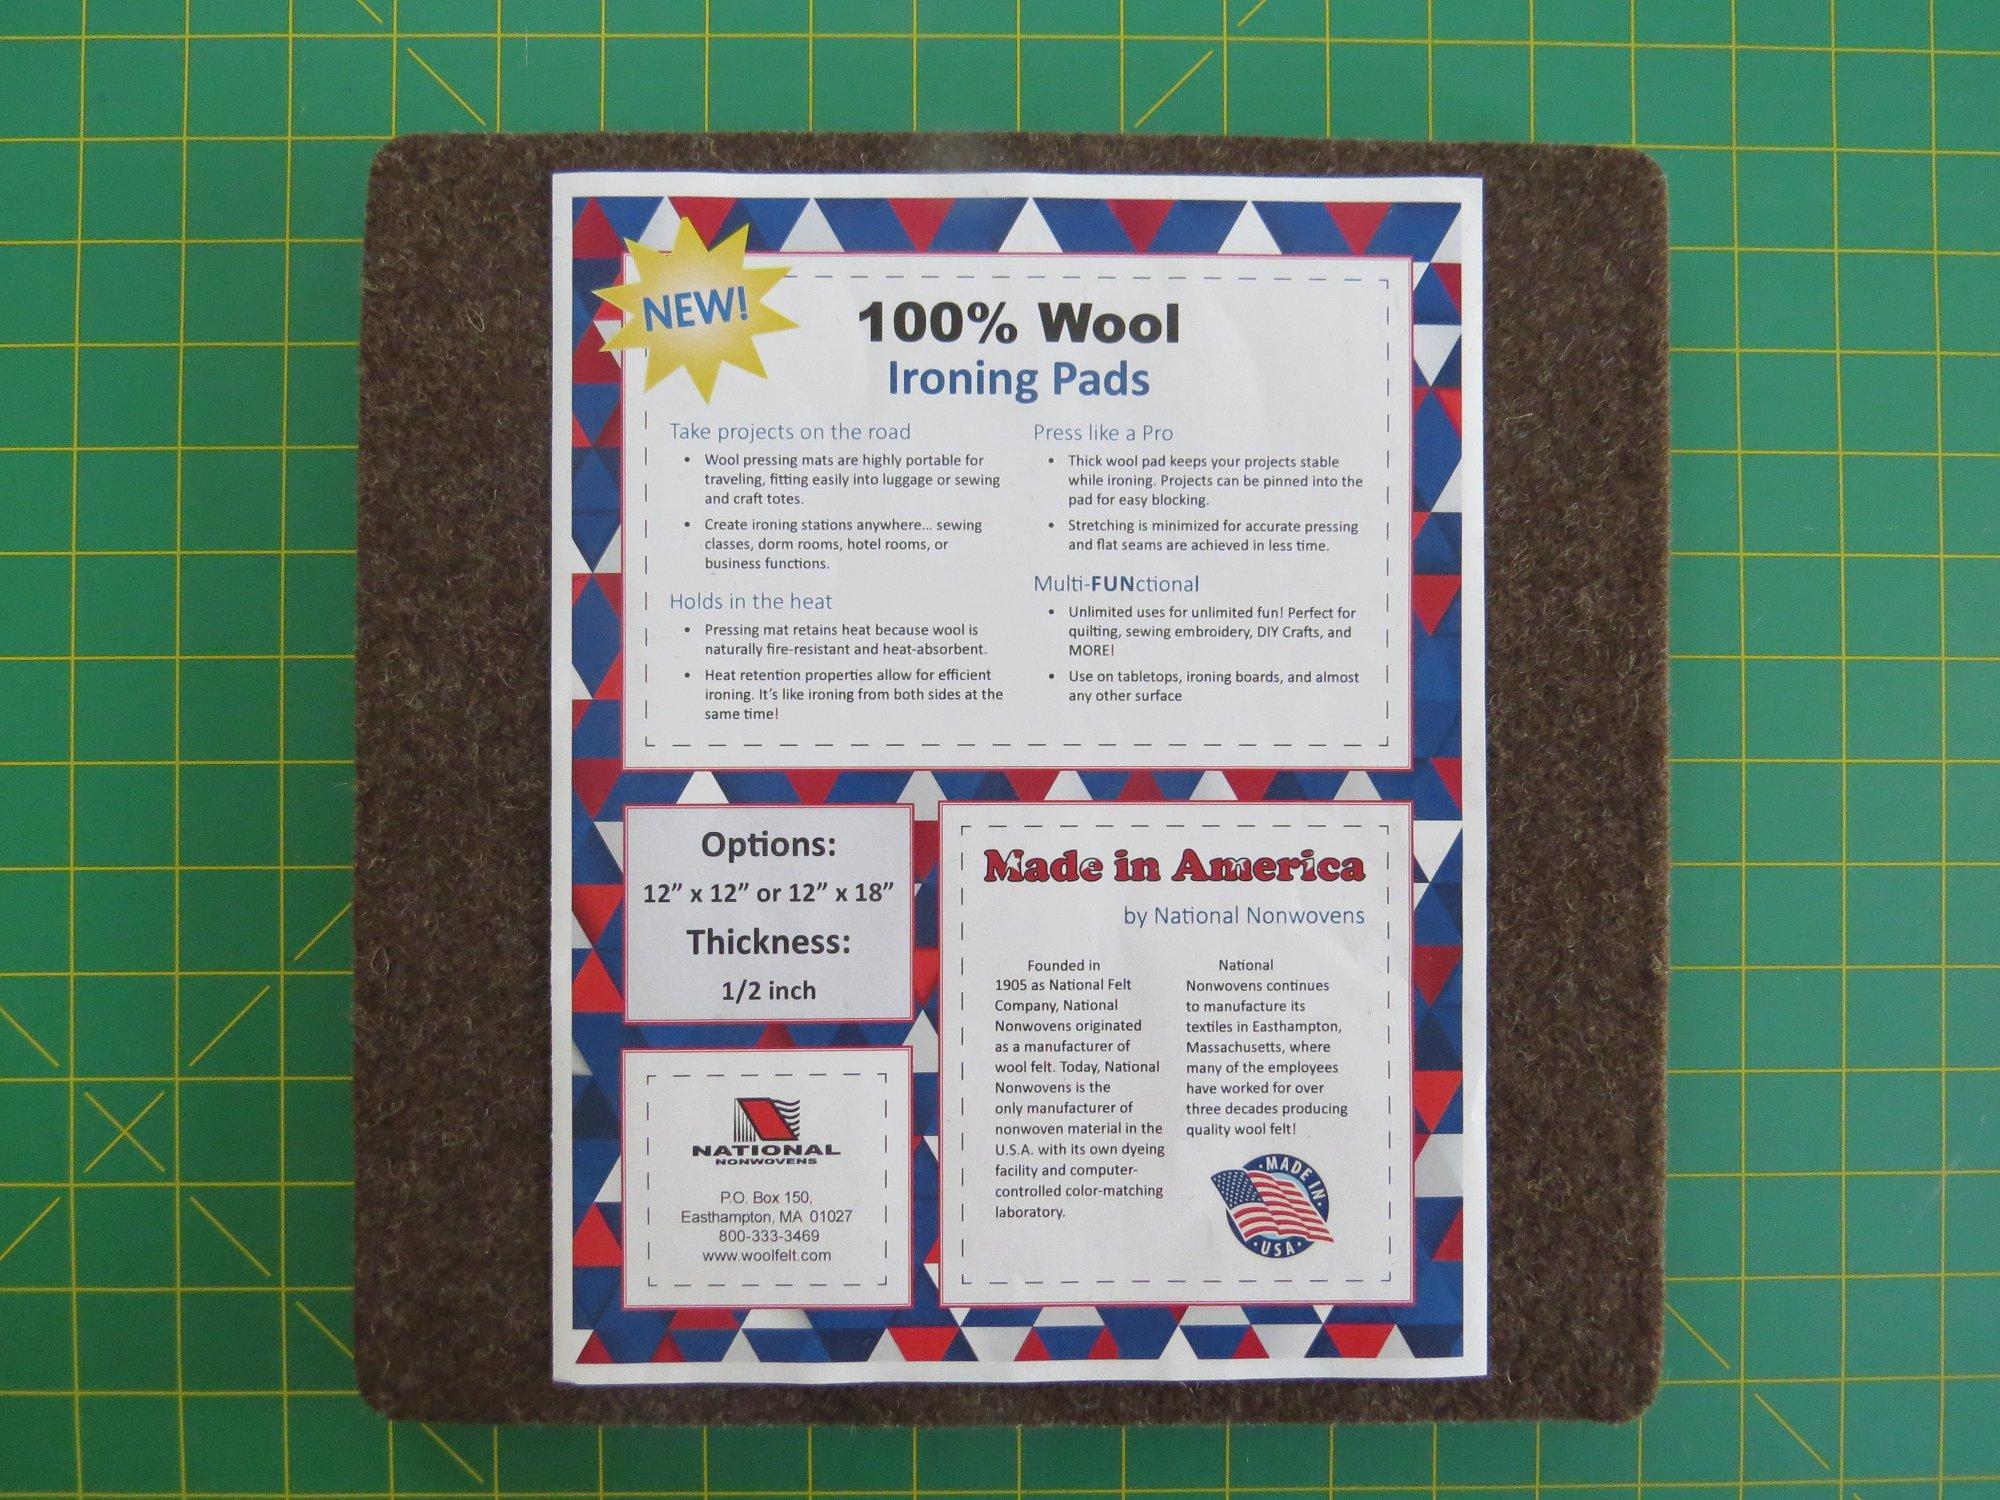 100% Wool Ironing Pad 12 x 12